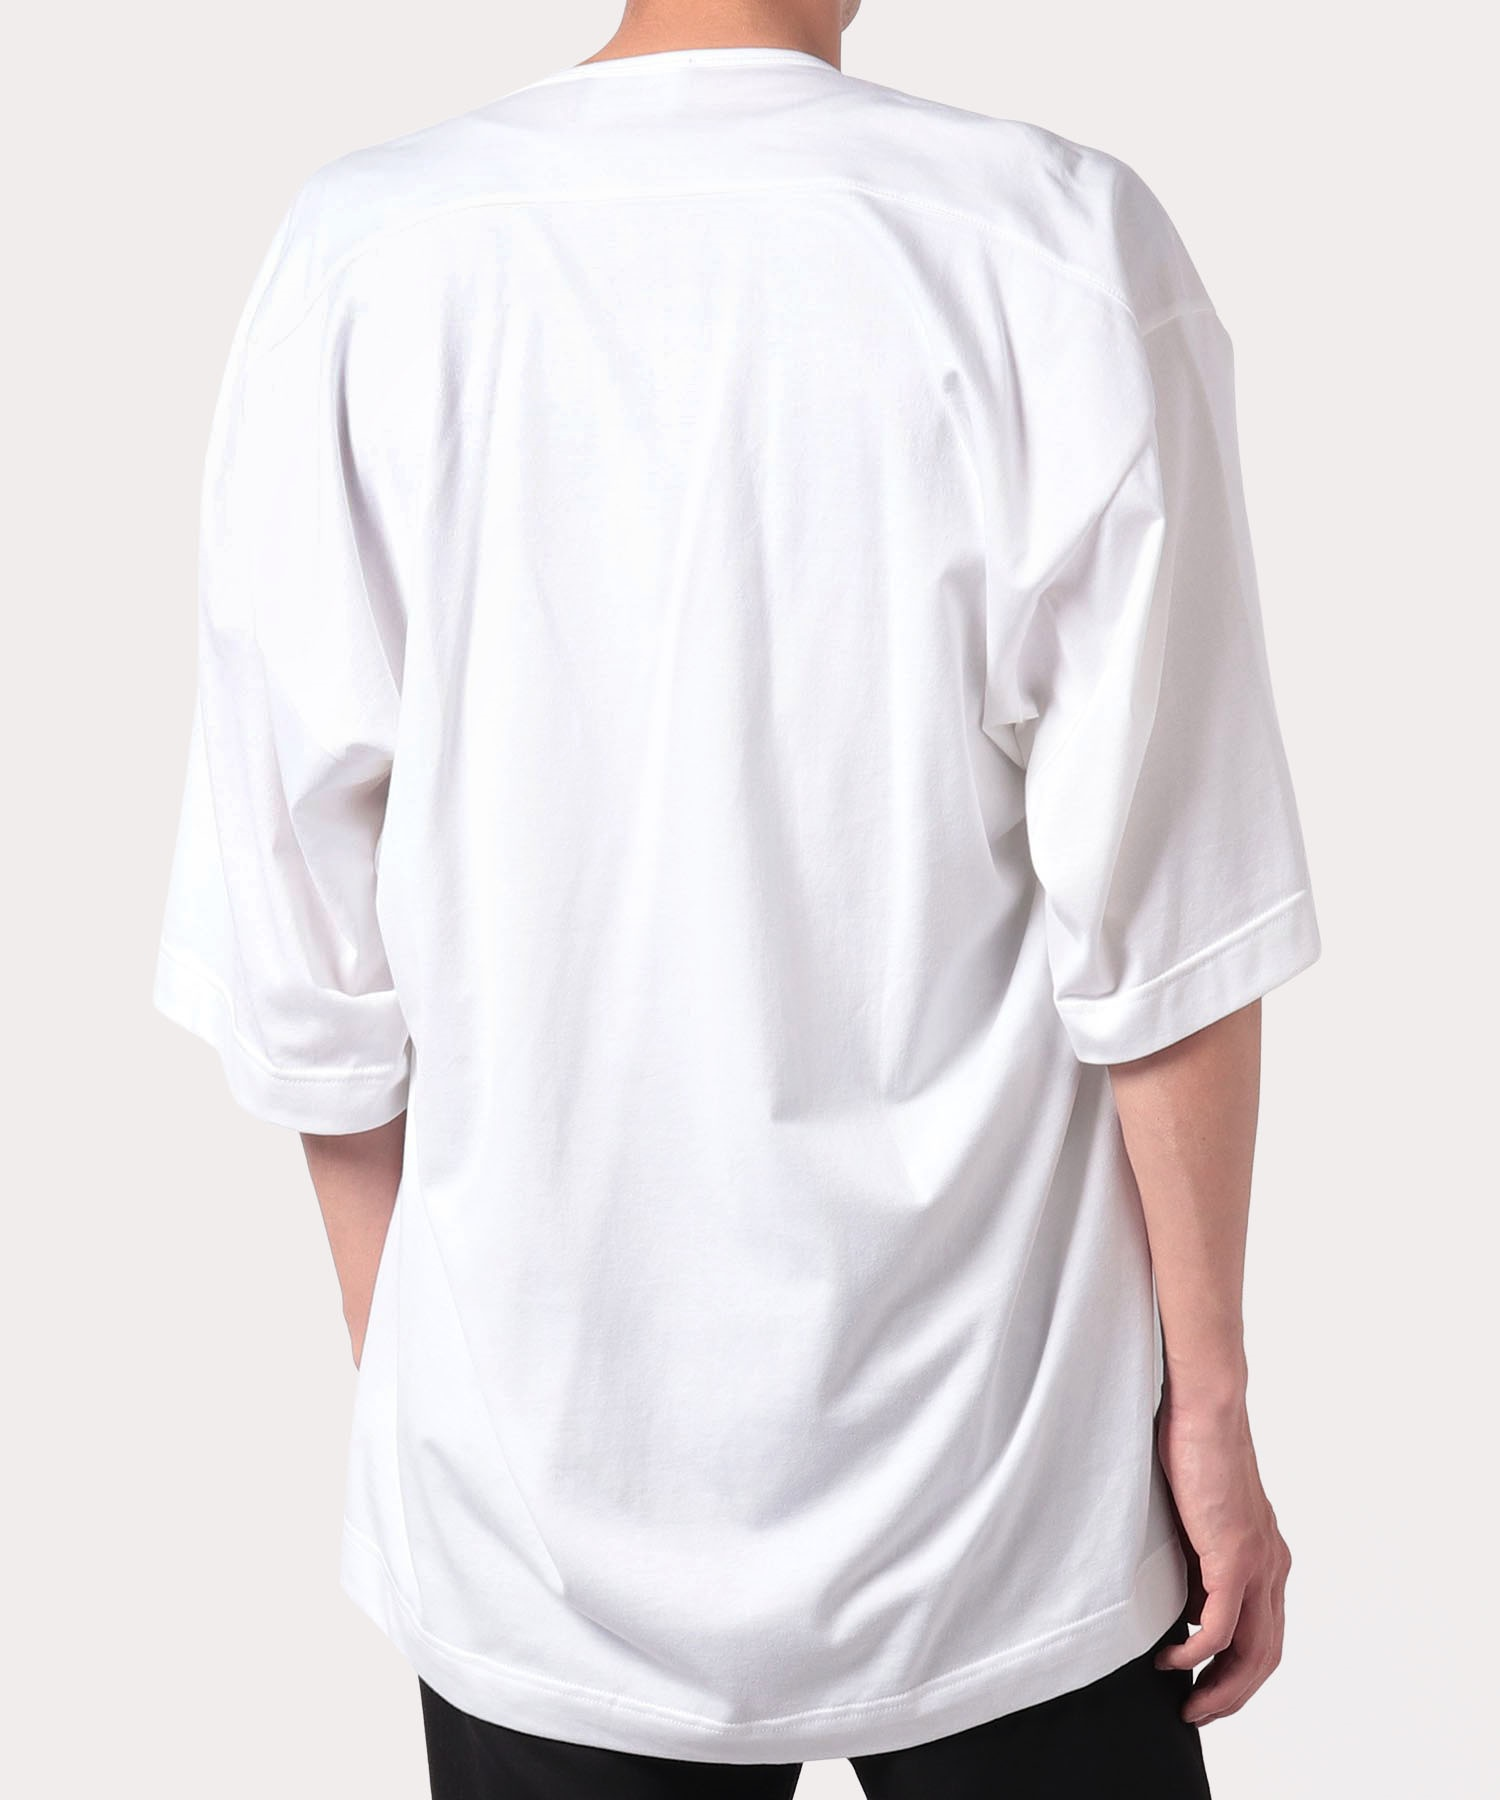 LIGHTING ORB ビッグTシャツ